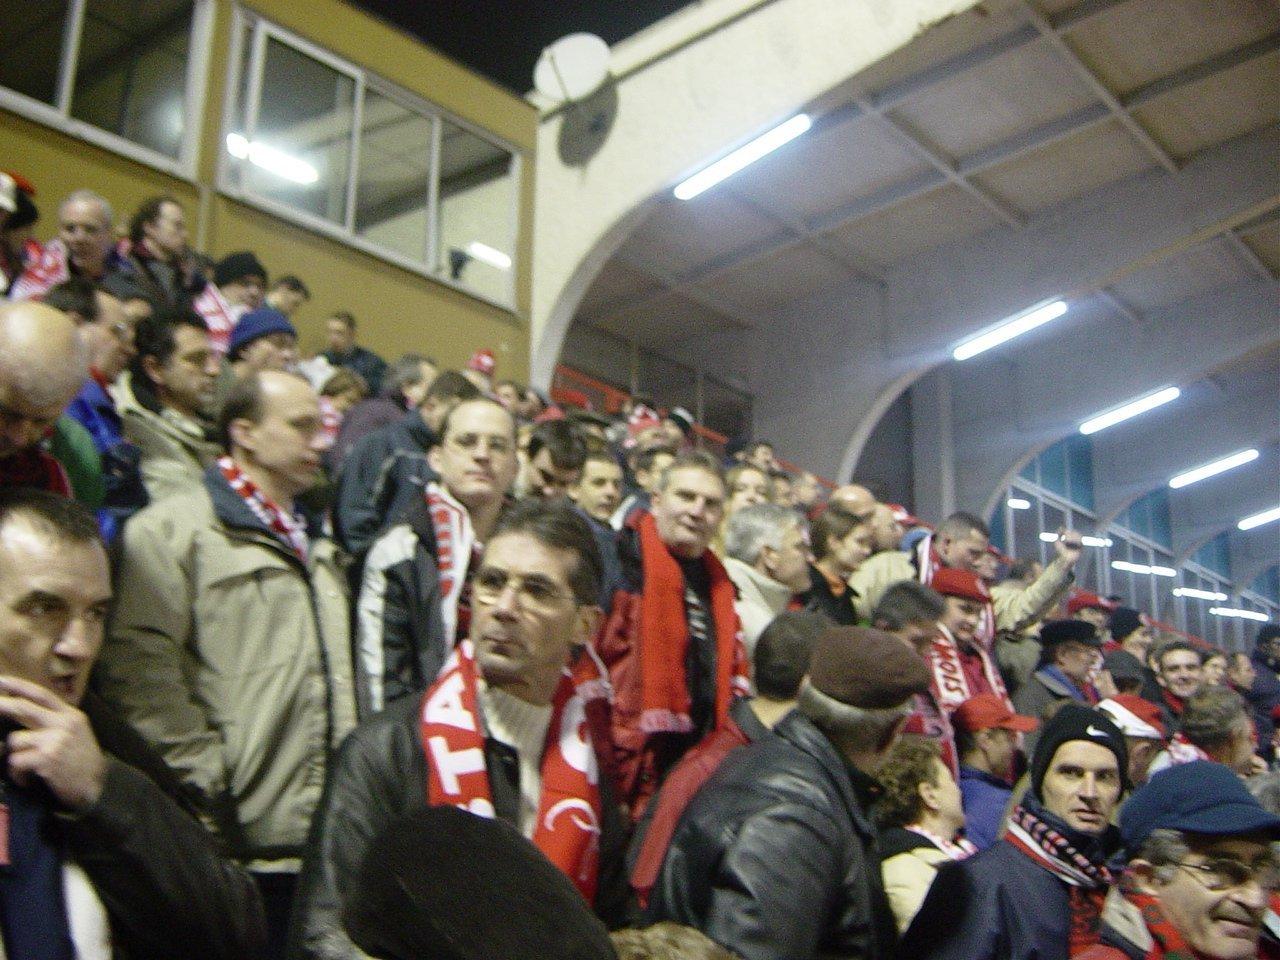 Club rencontres reims